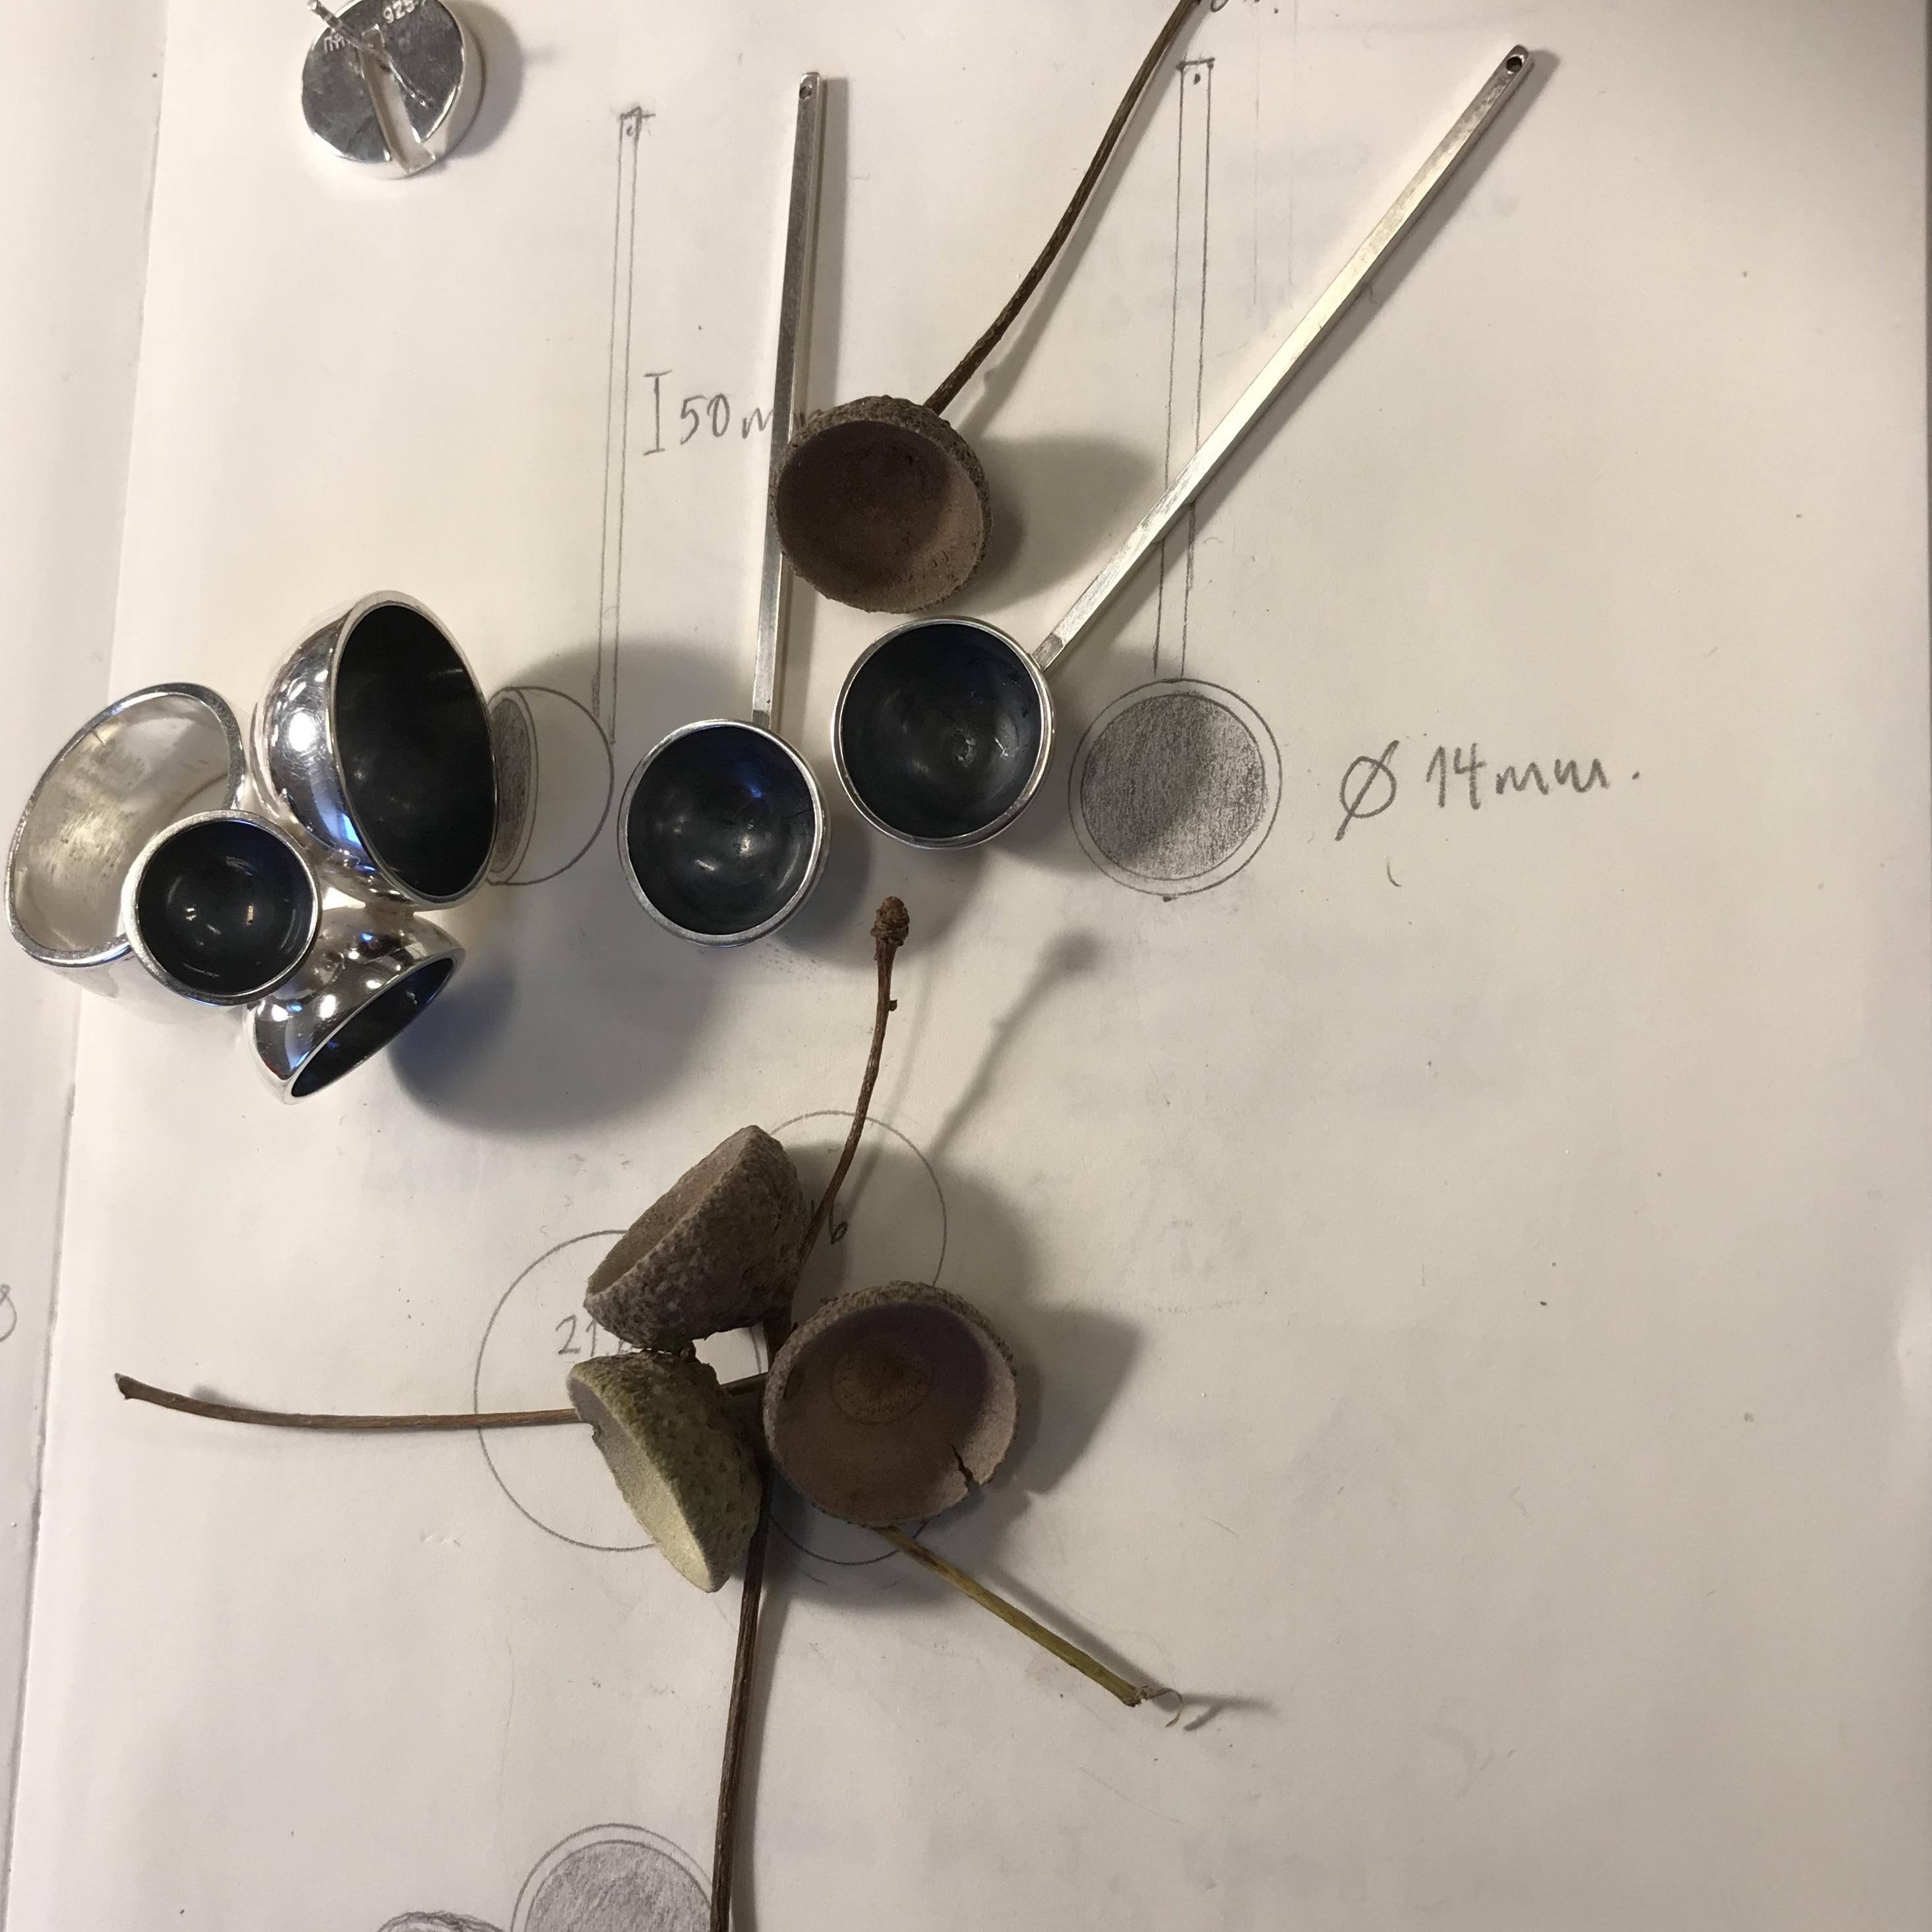 oxiderat silverörhänge med ekollon. oxidised silver earring with acorn.